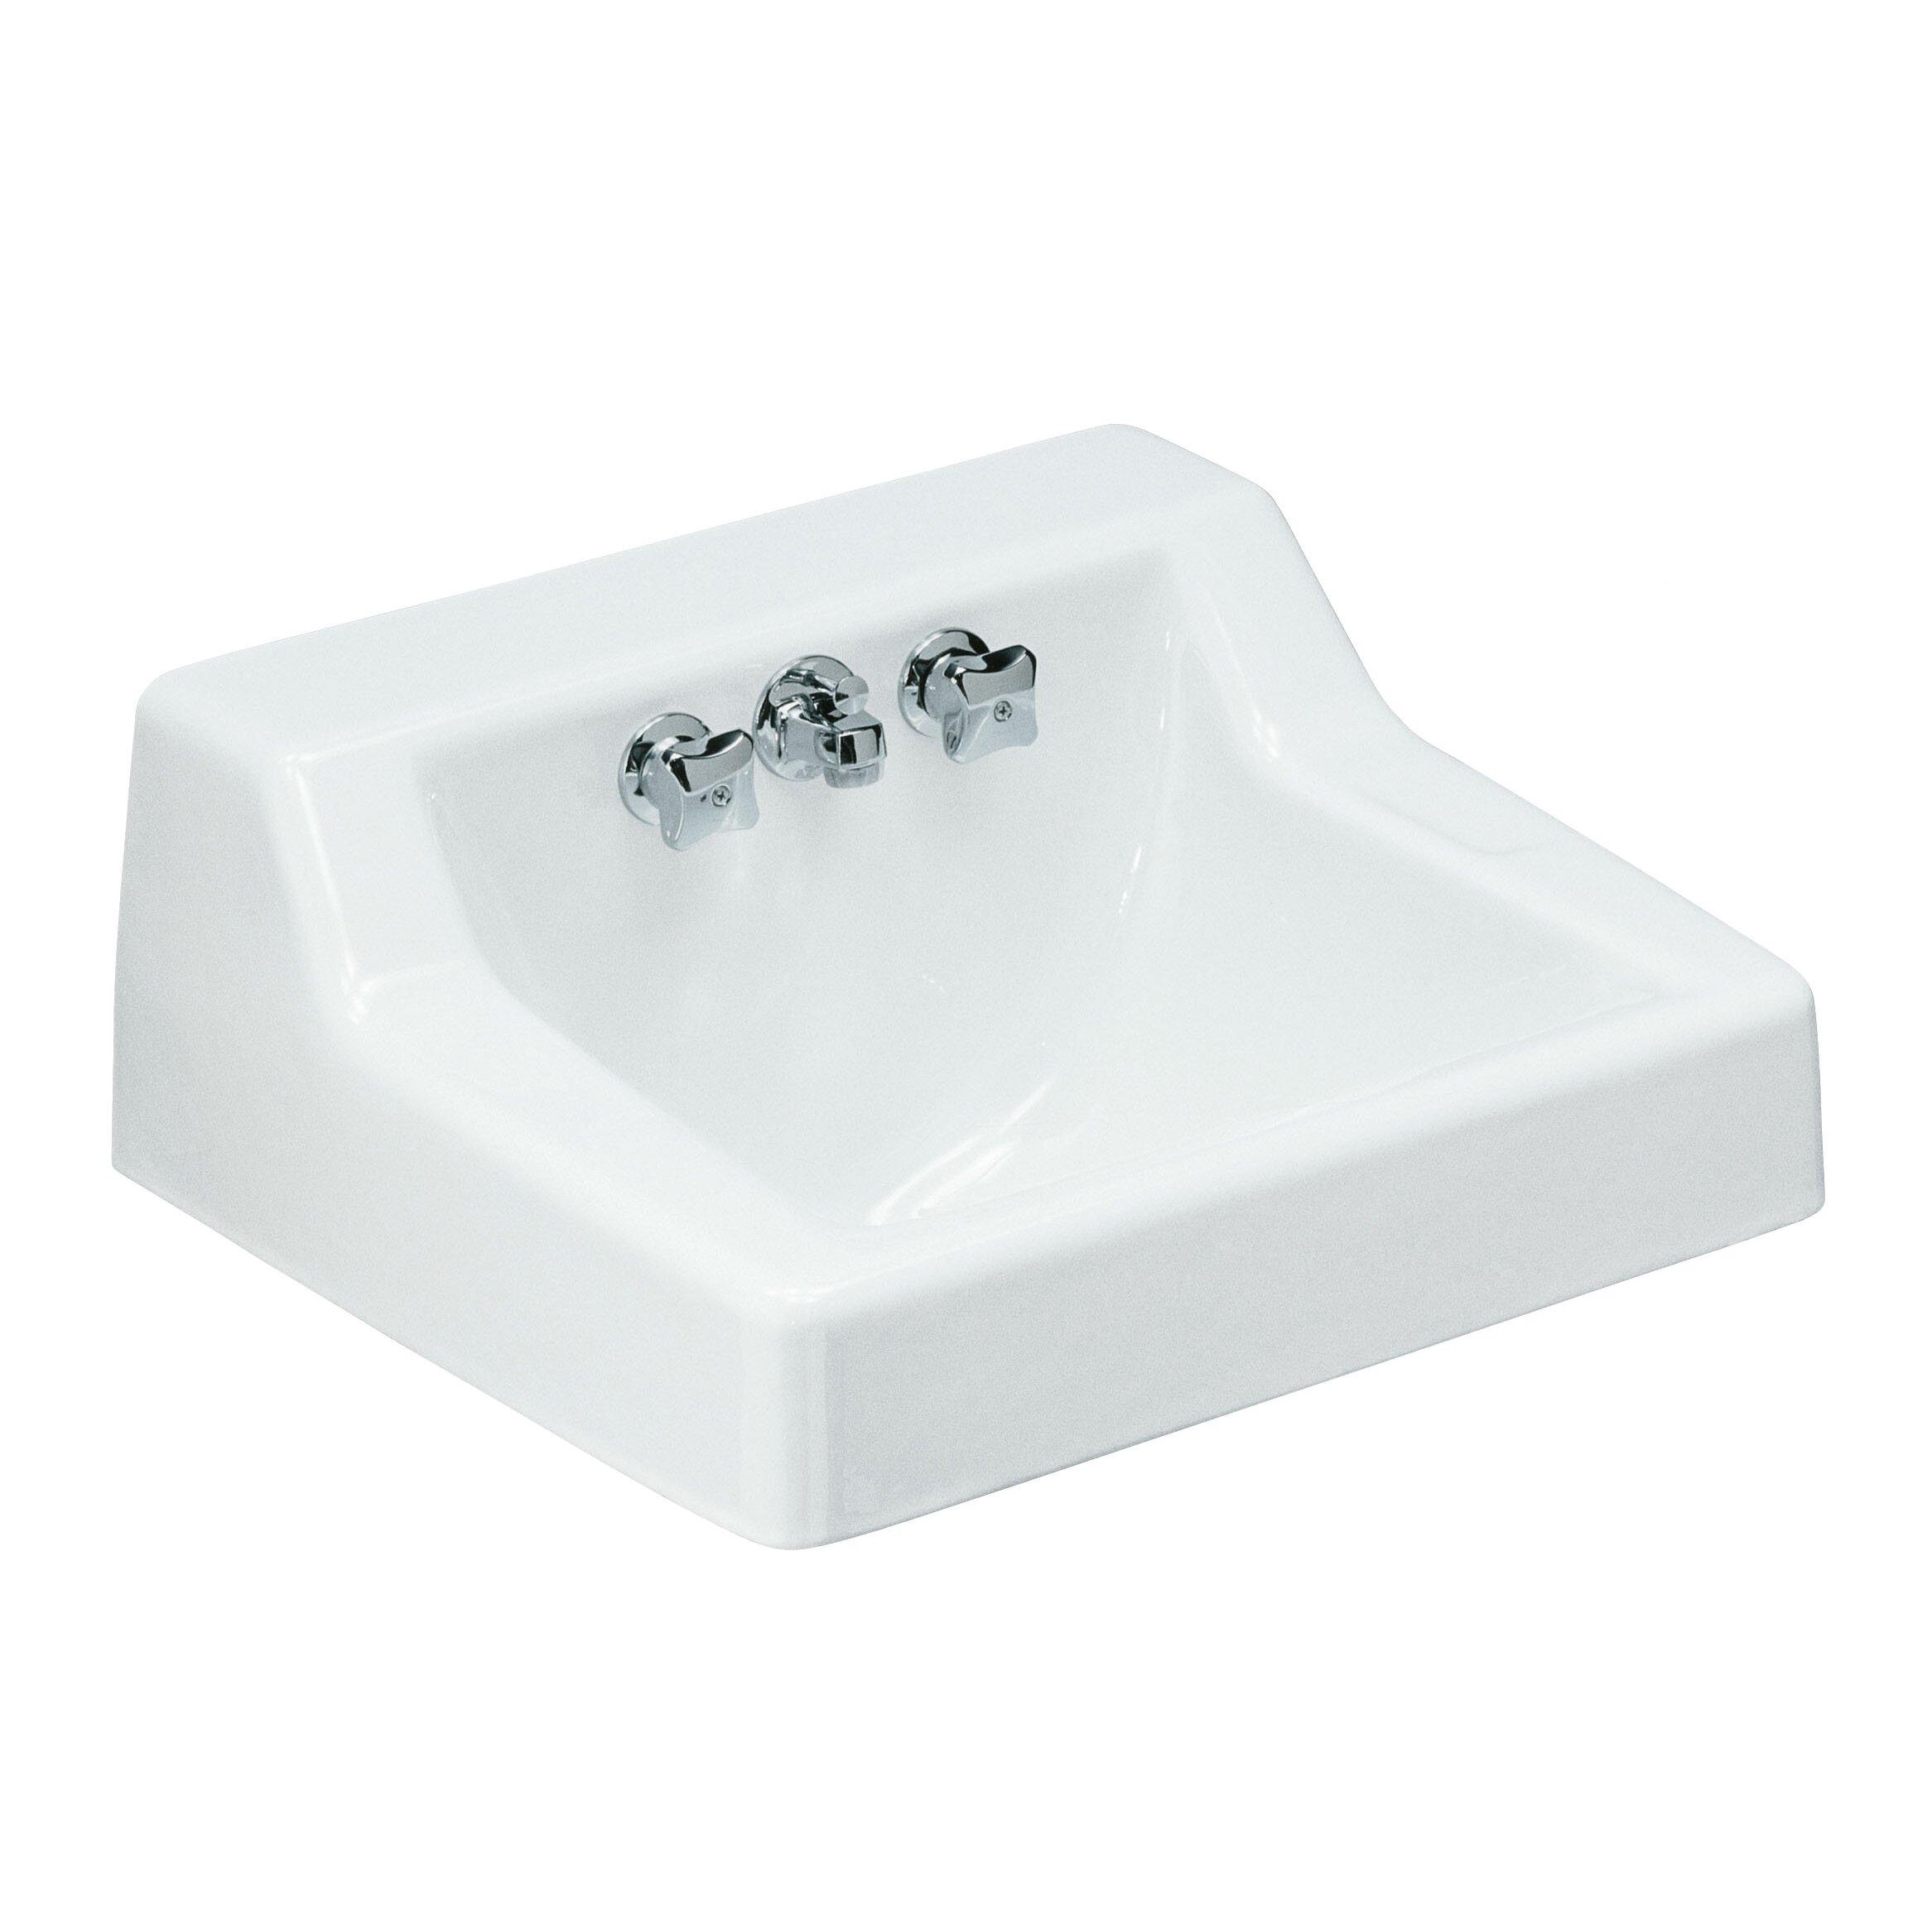 Kohler hampton wall mounted commercial bathroom sink with - Kohler wall mount bathroom sink faucet ...